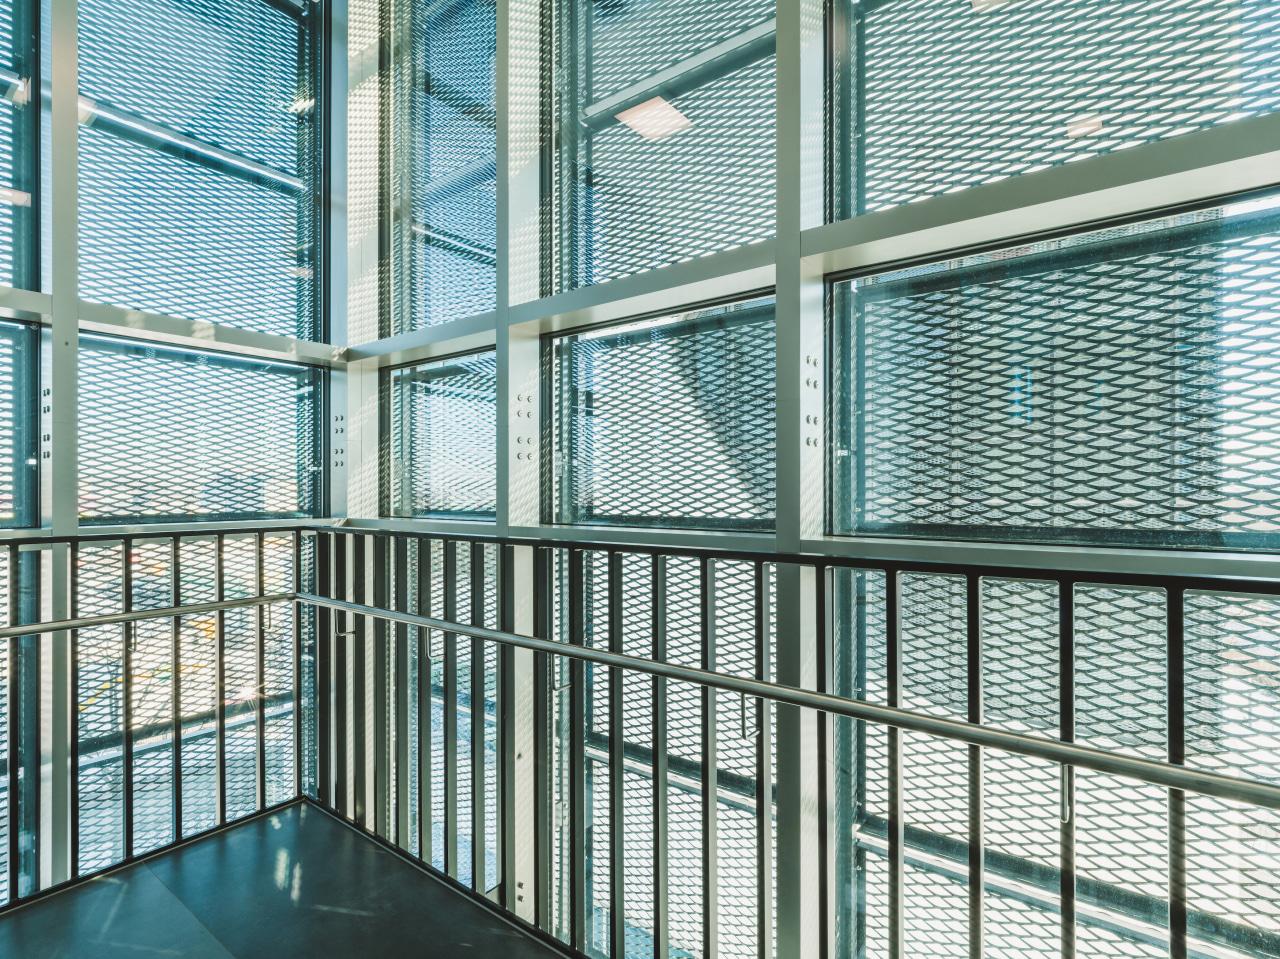 Patterned glass was utilised to avoid bird strike.